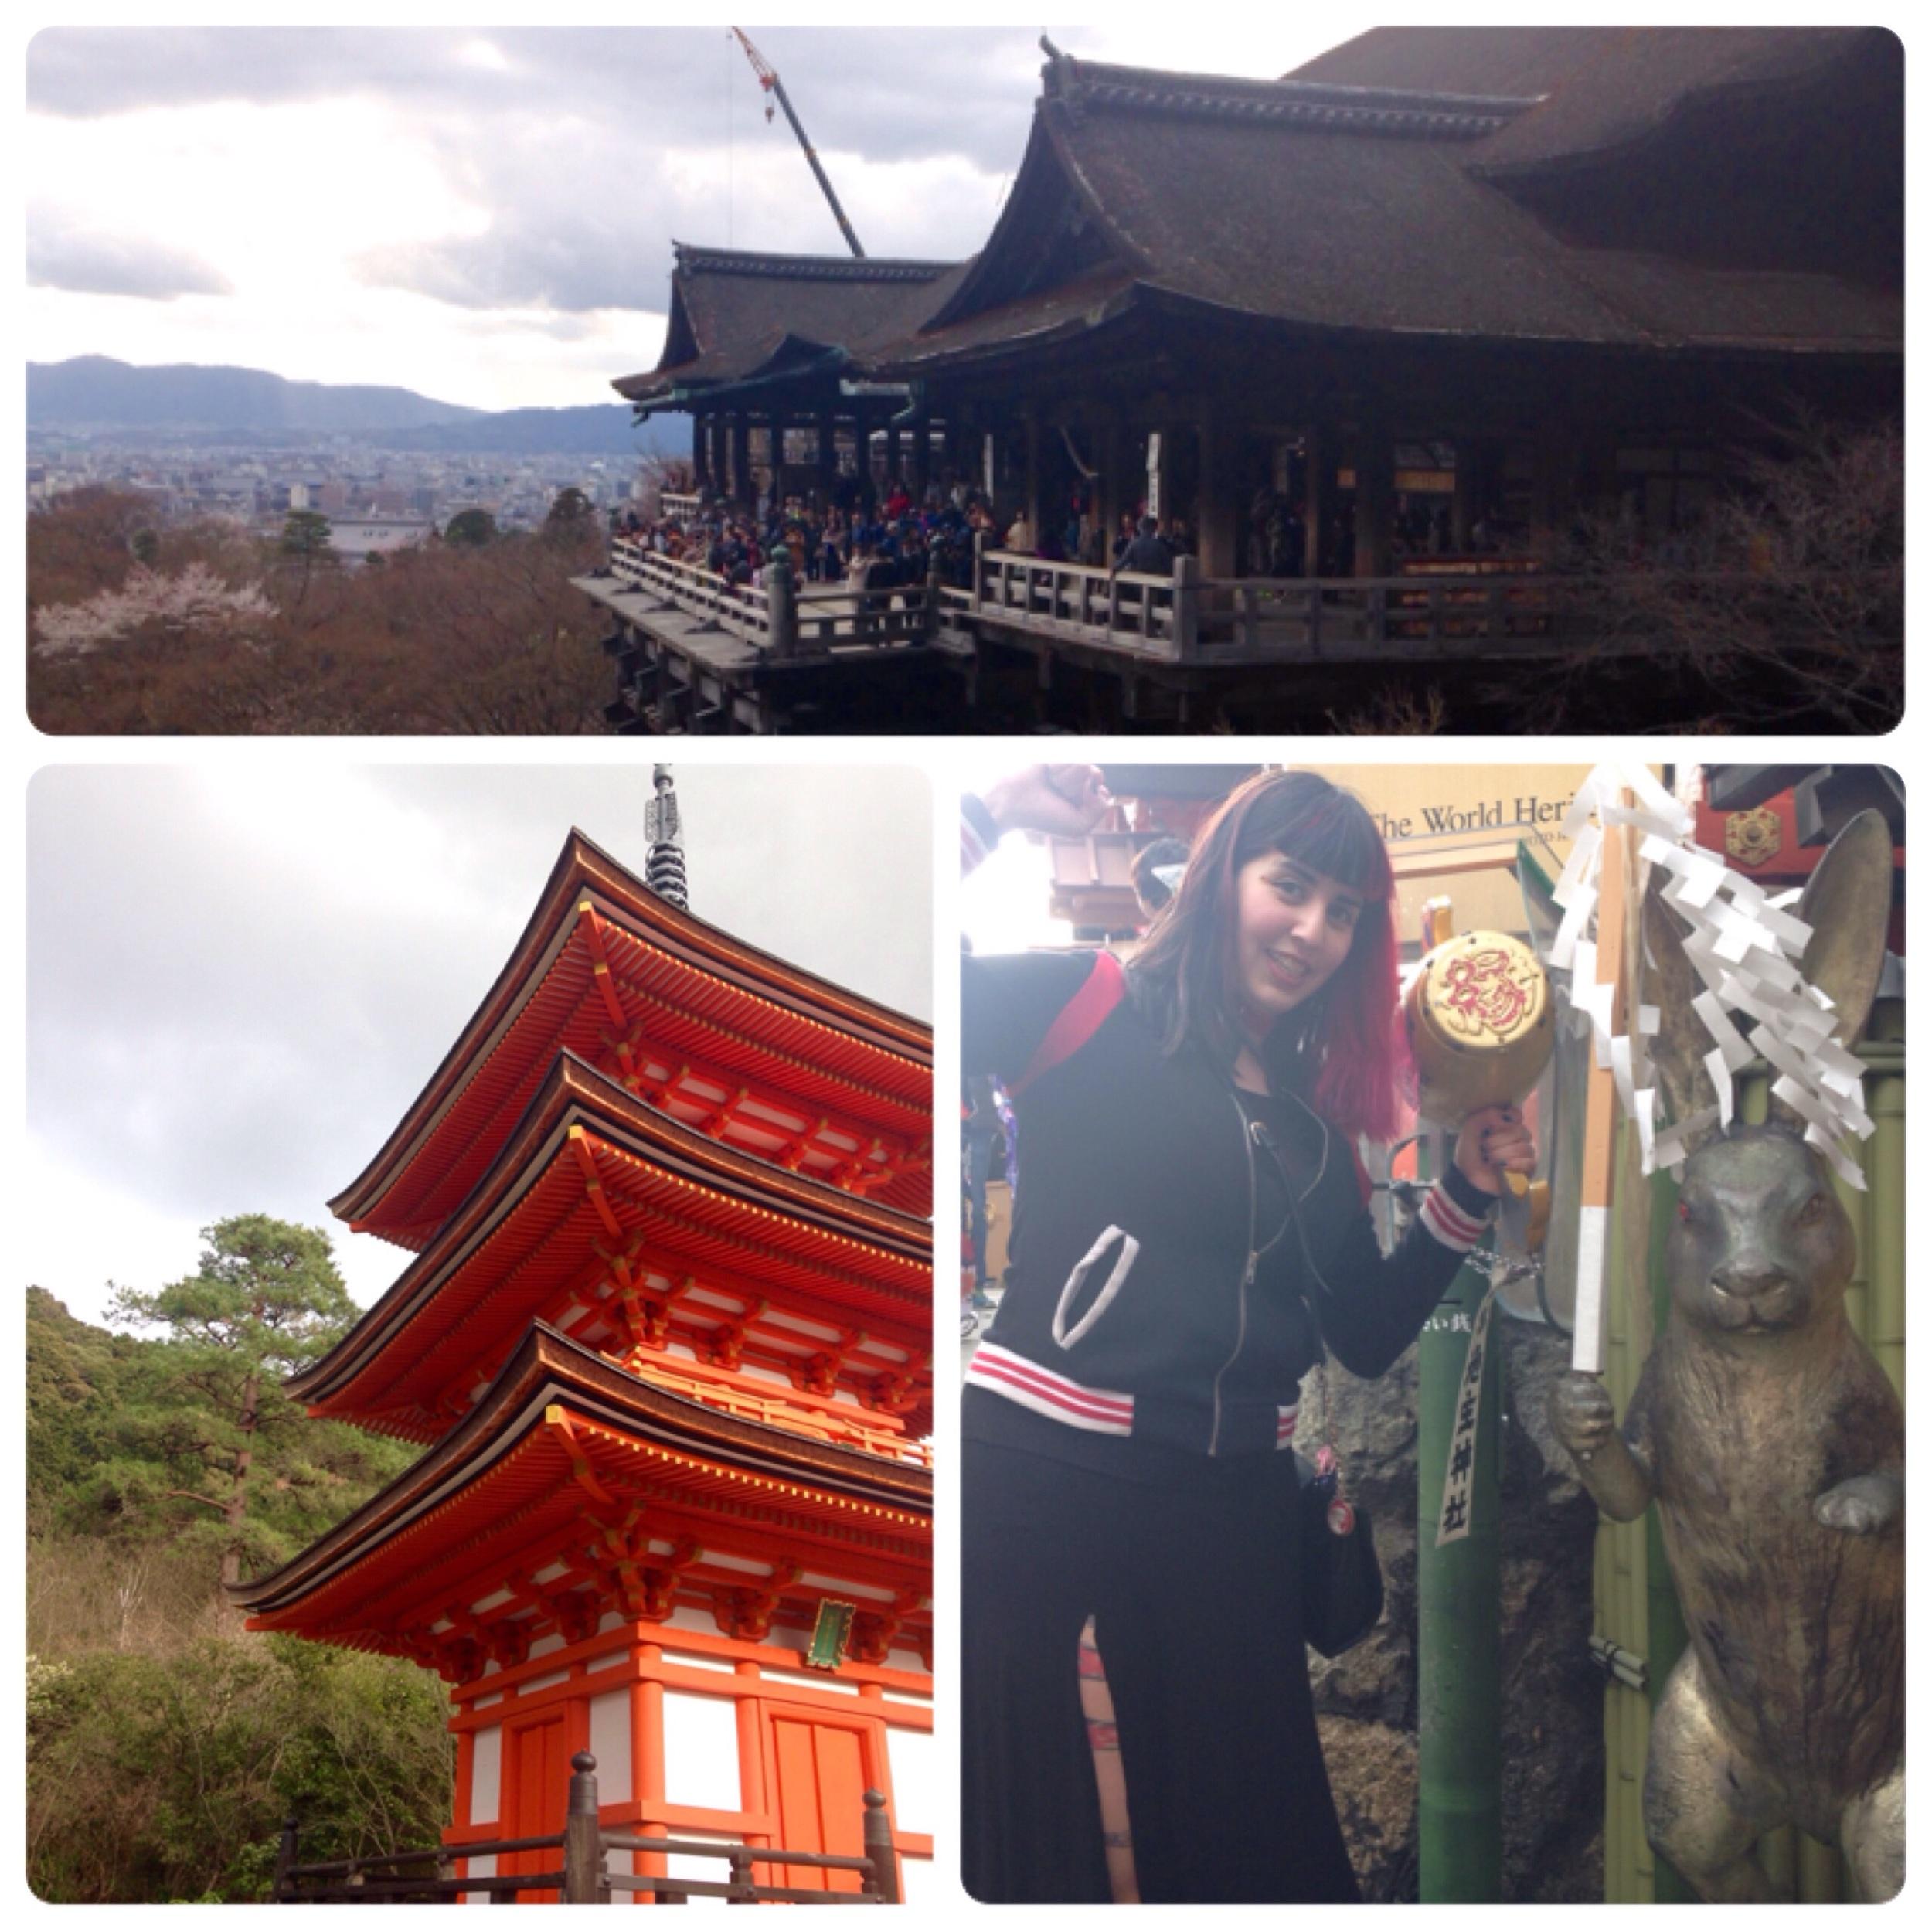 The main shrine on top, a pagoda and me with the love bun.